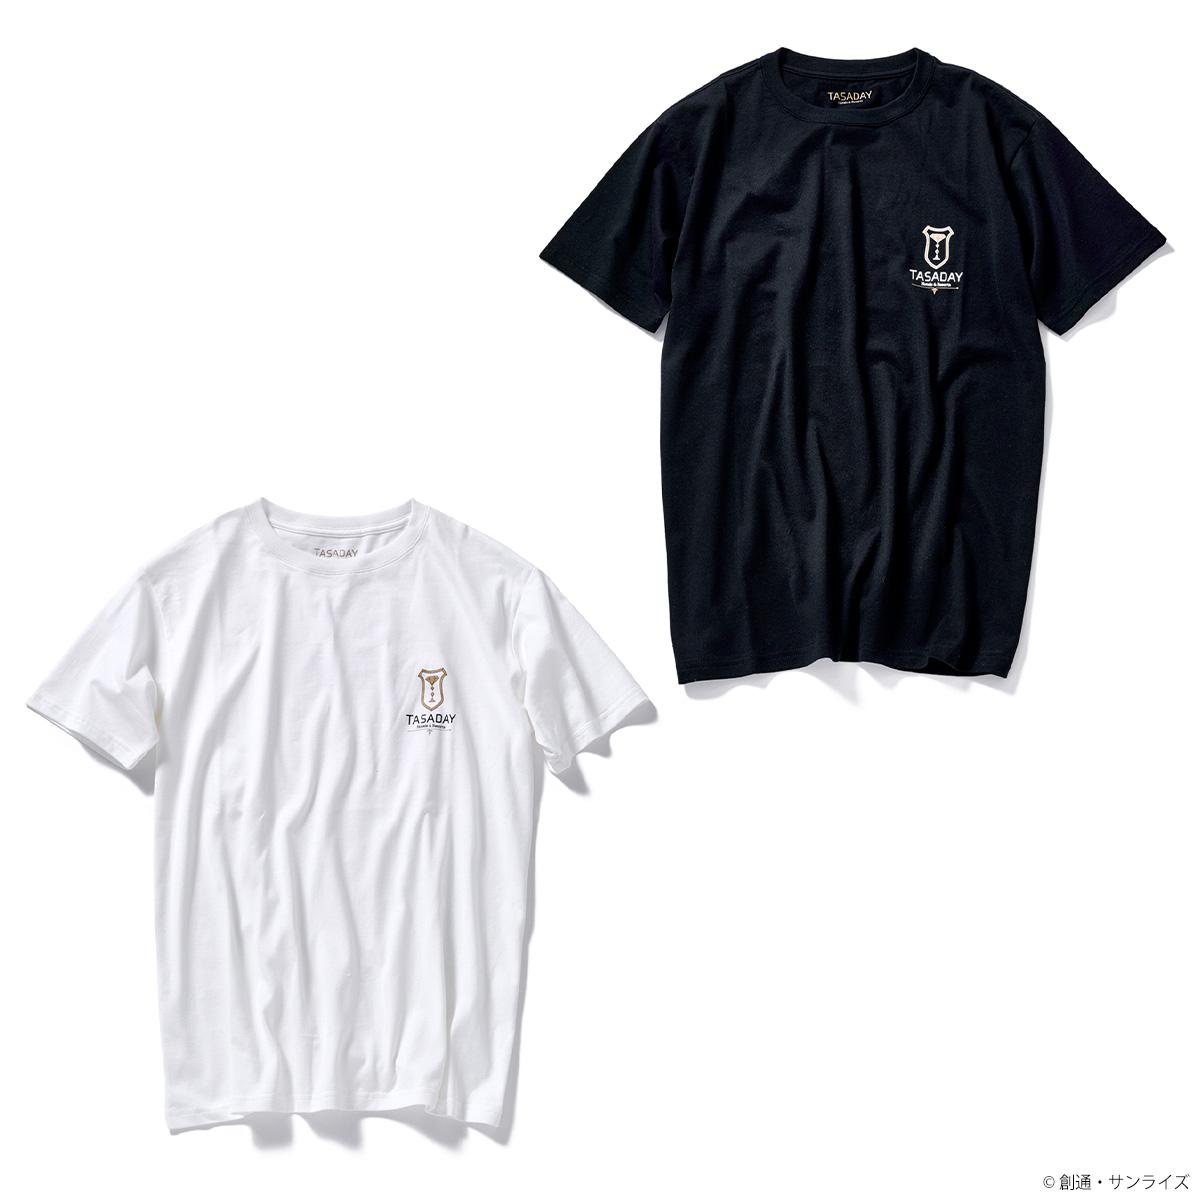 STRICT-G『機動戦士ガンダム 閃光のハサウェイ』 TASADAY HOTELS Tシャツ